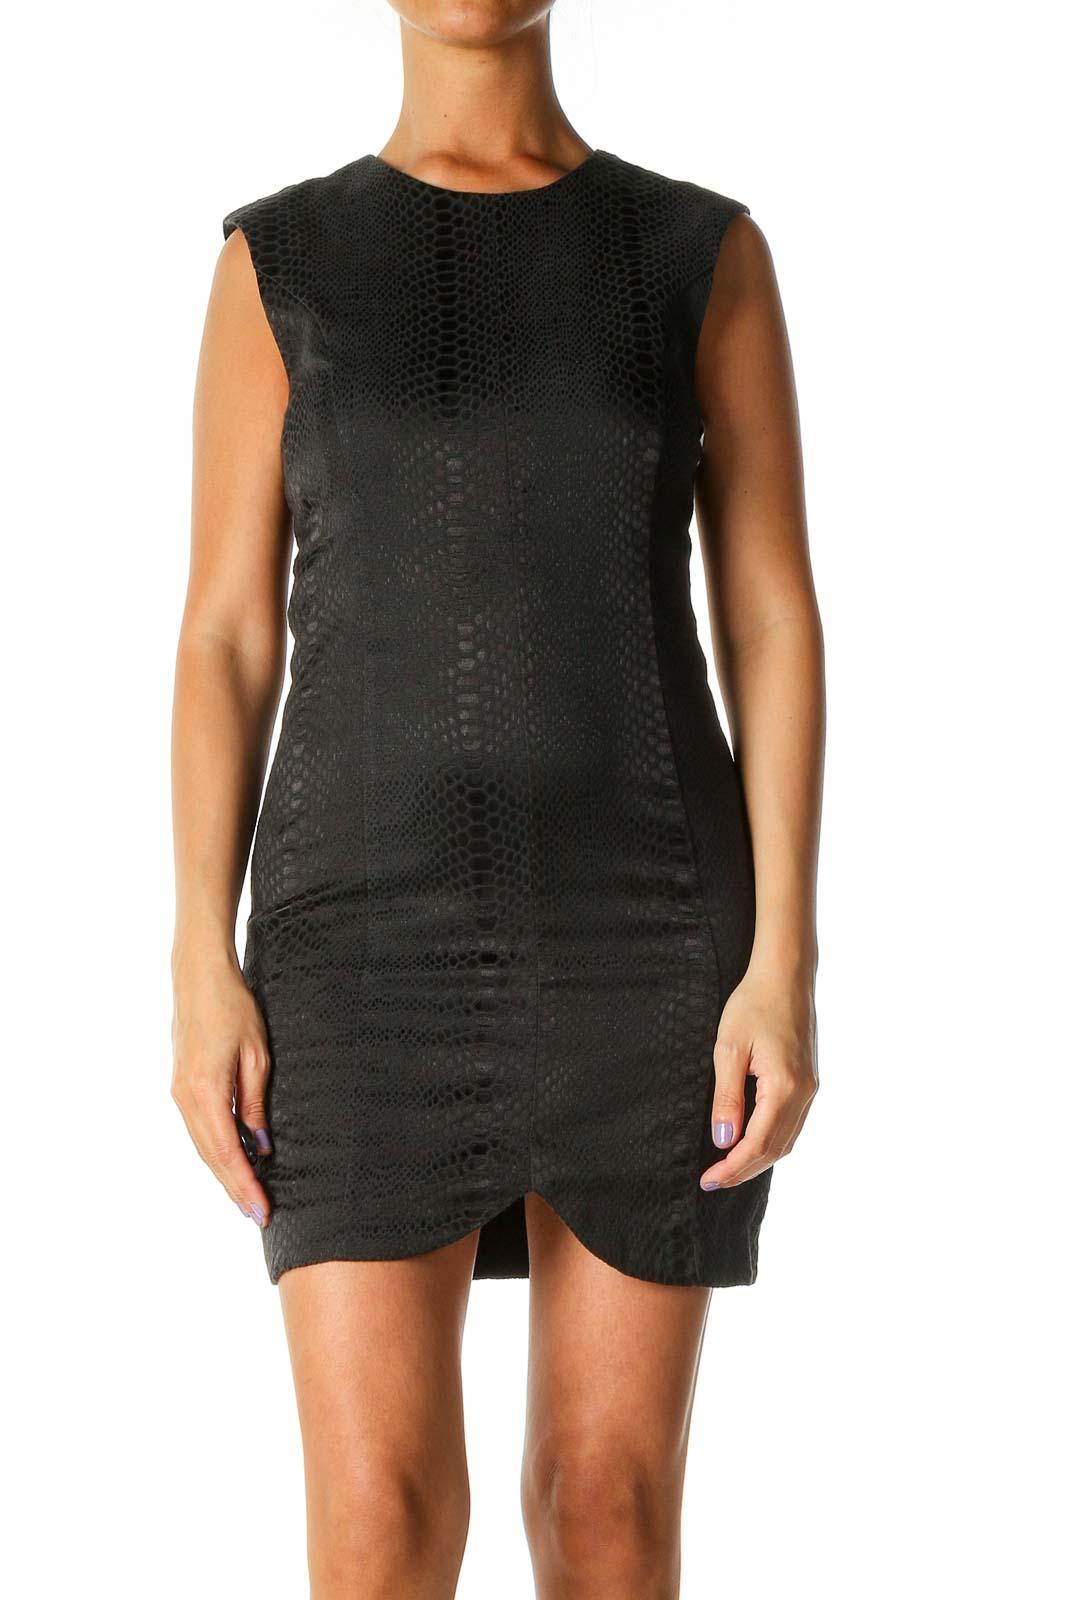 Black Textured Cocktail Sheath Dress Front